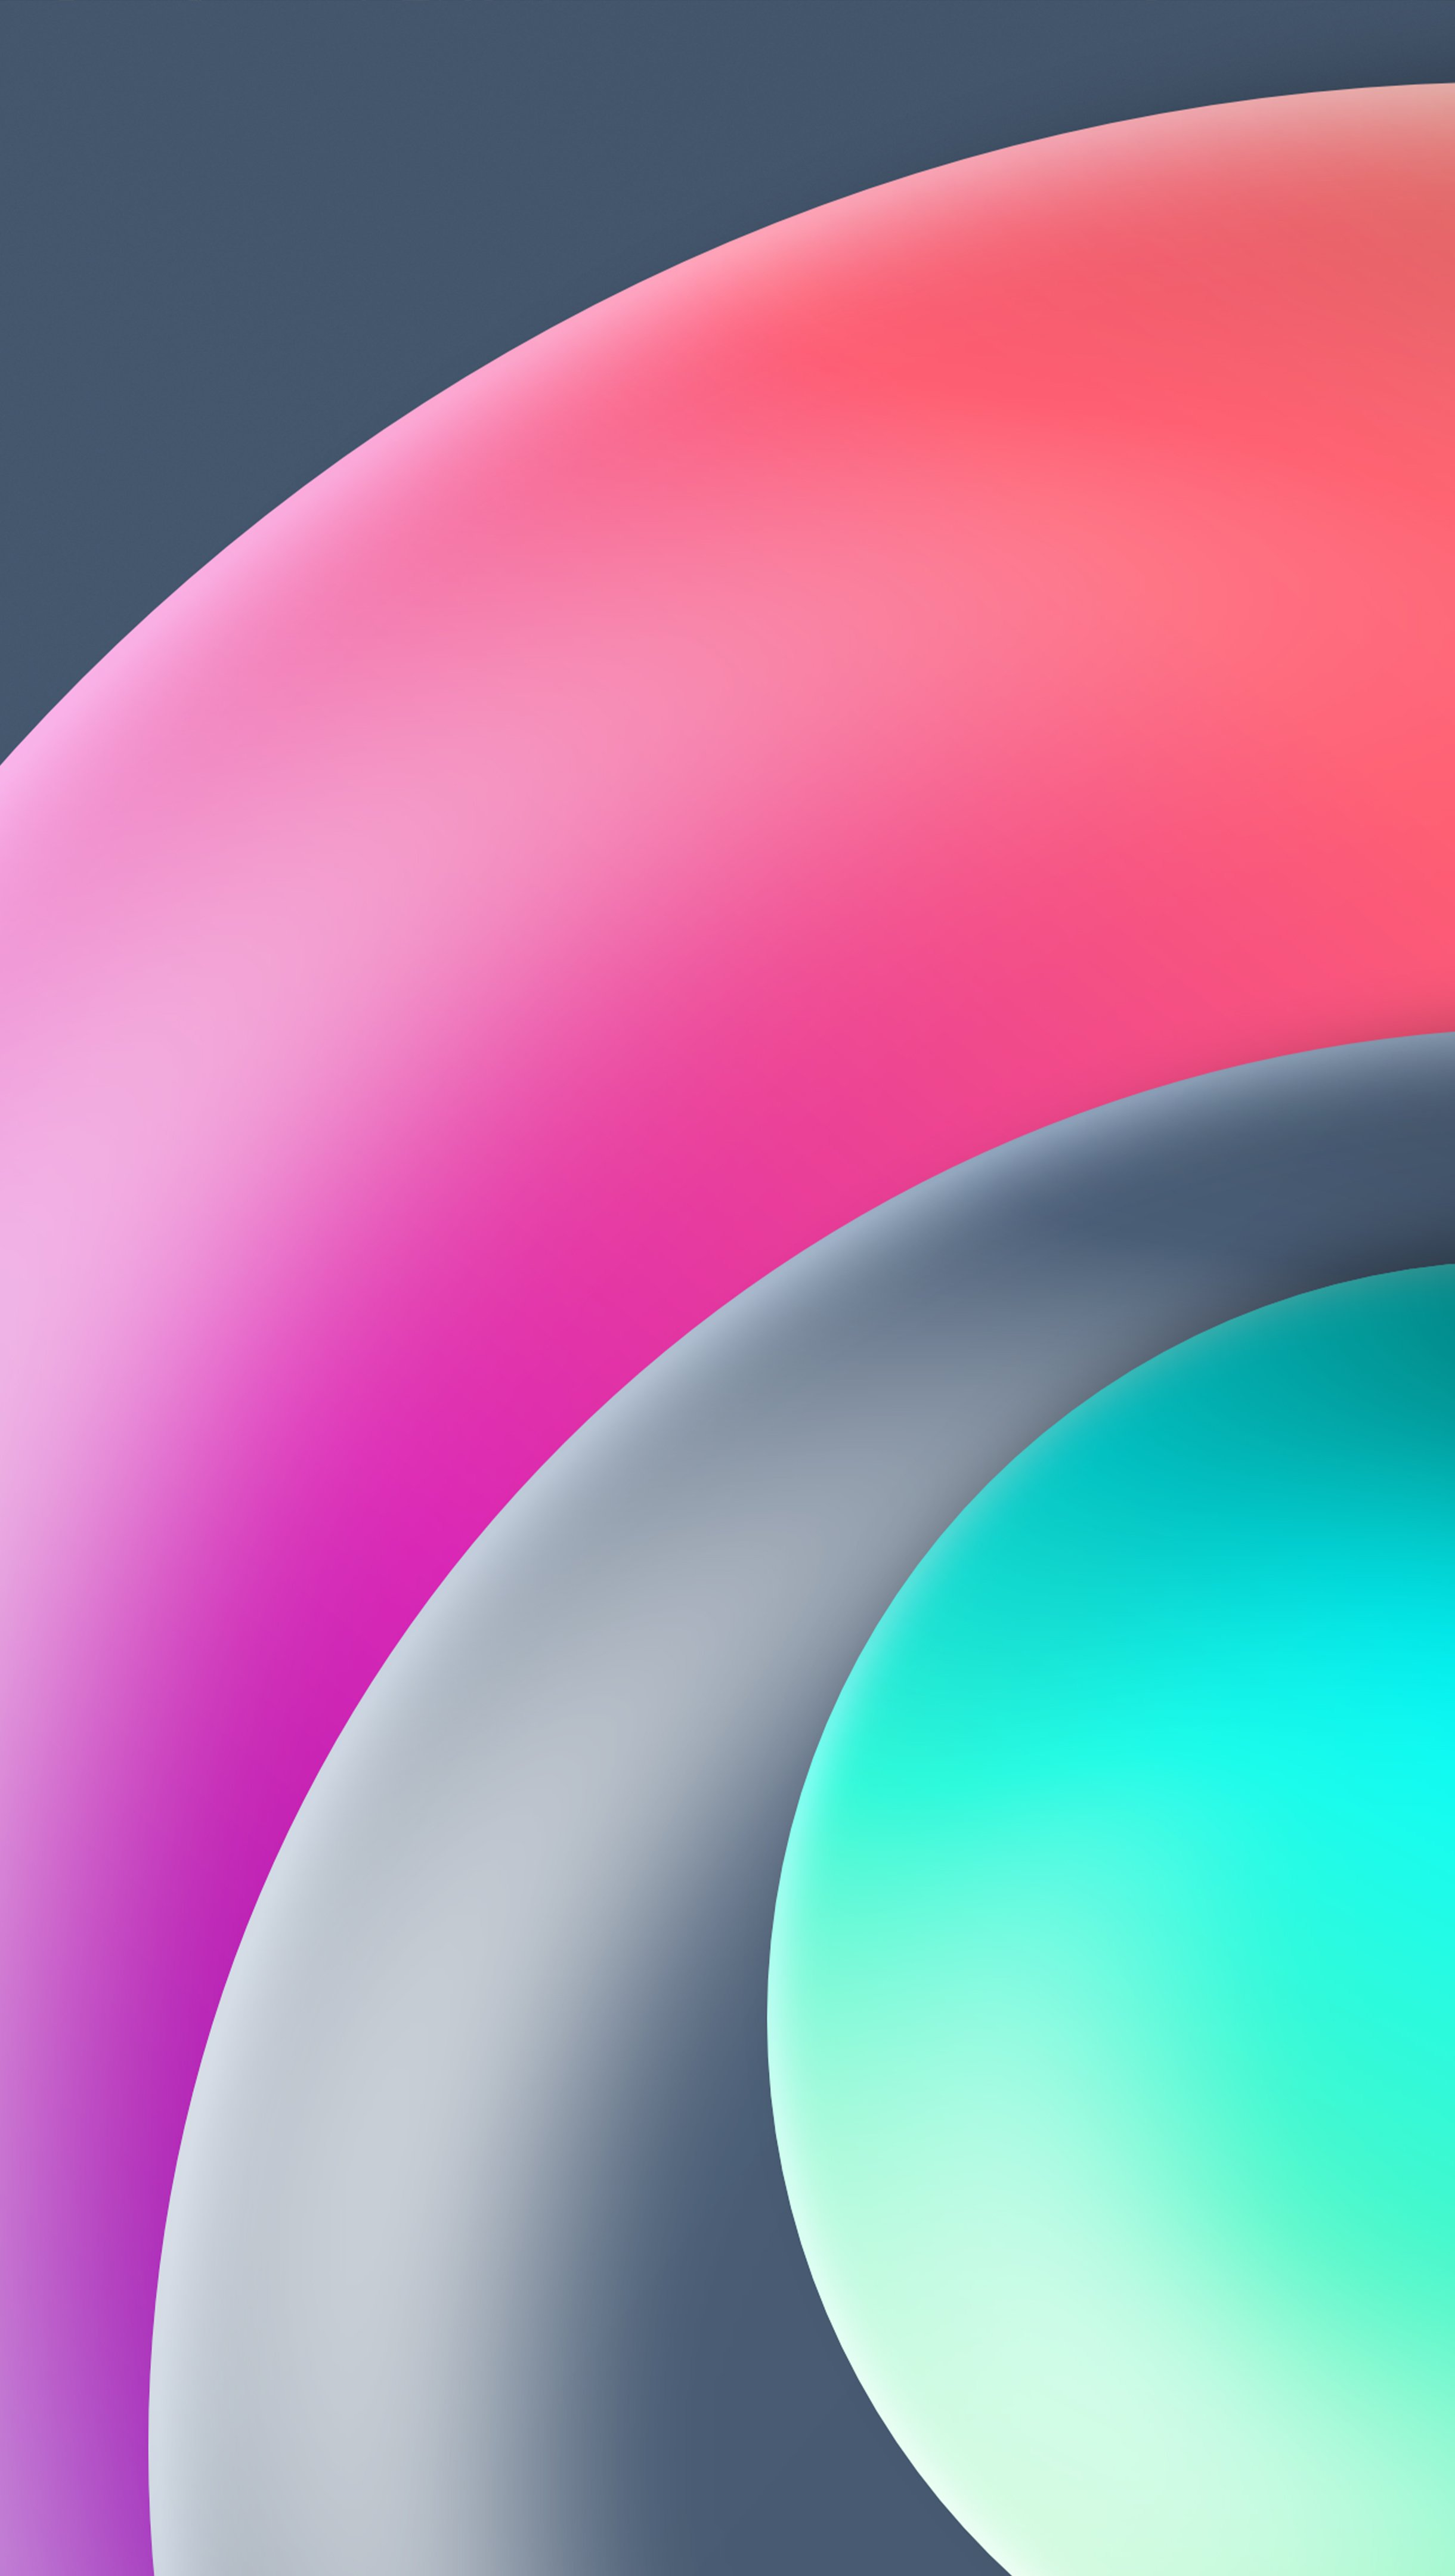 Fondos de pantalla Circulos en 3D Vertical